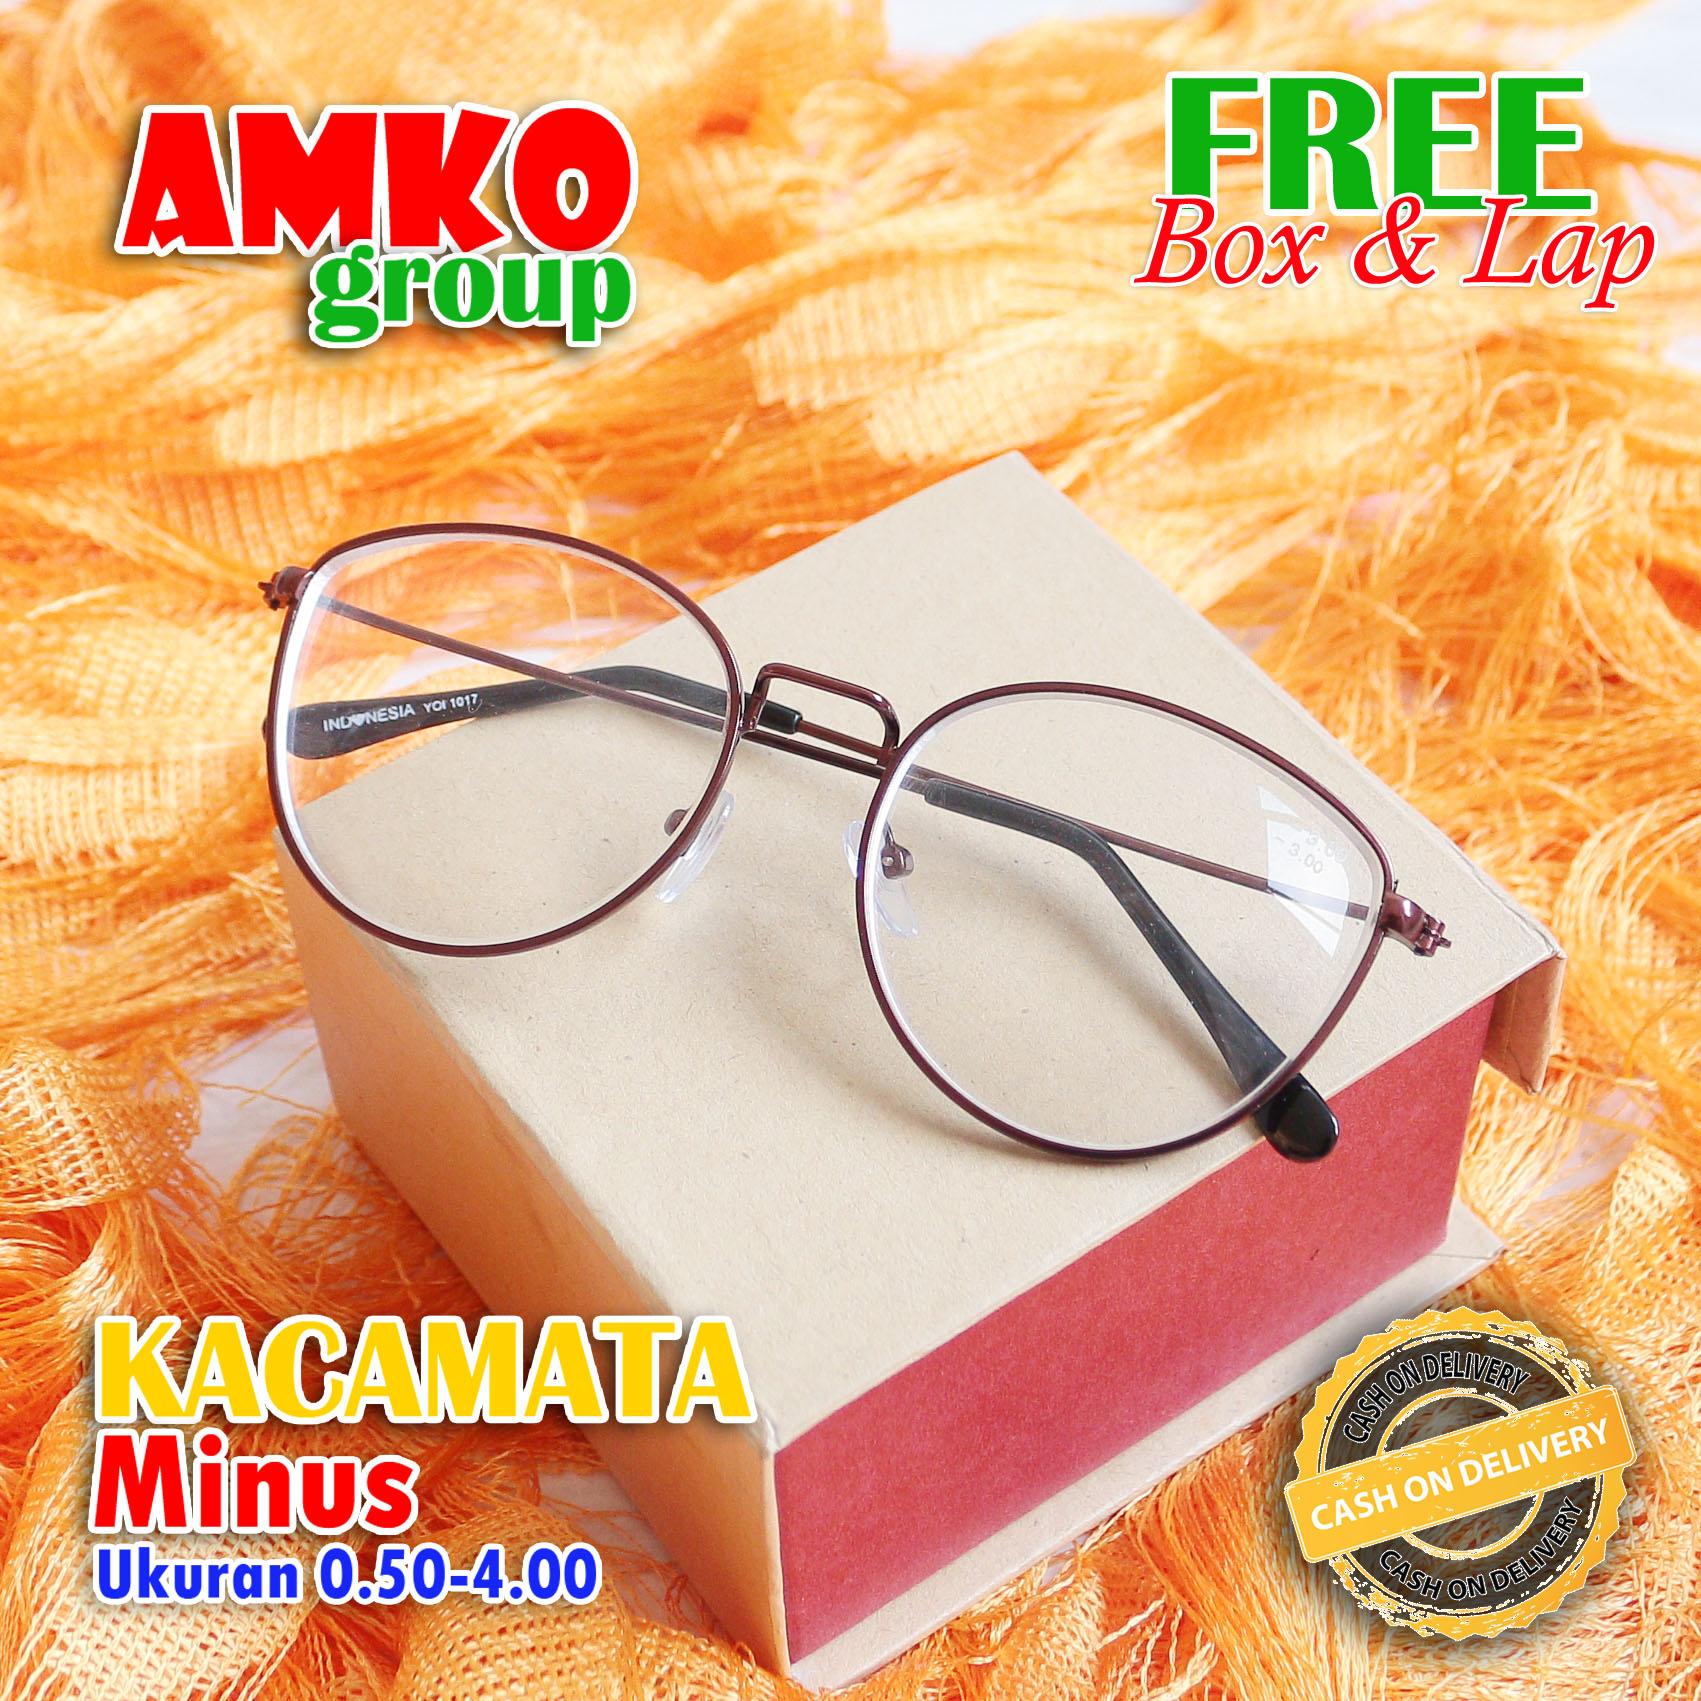 kacamata minus oval list besi  optik style korean 0.50-4.00 free box lap pembersih